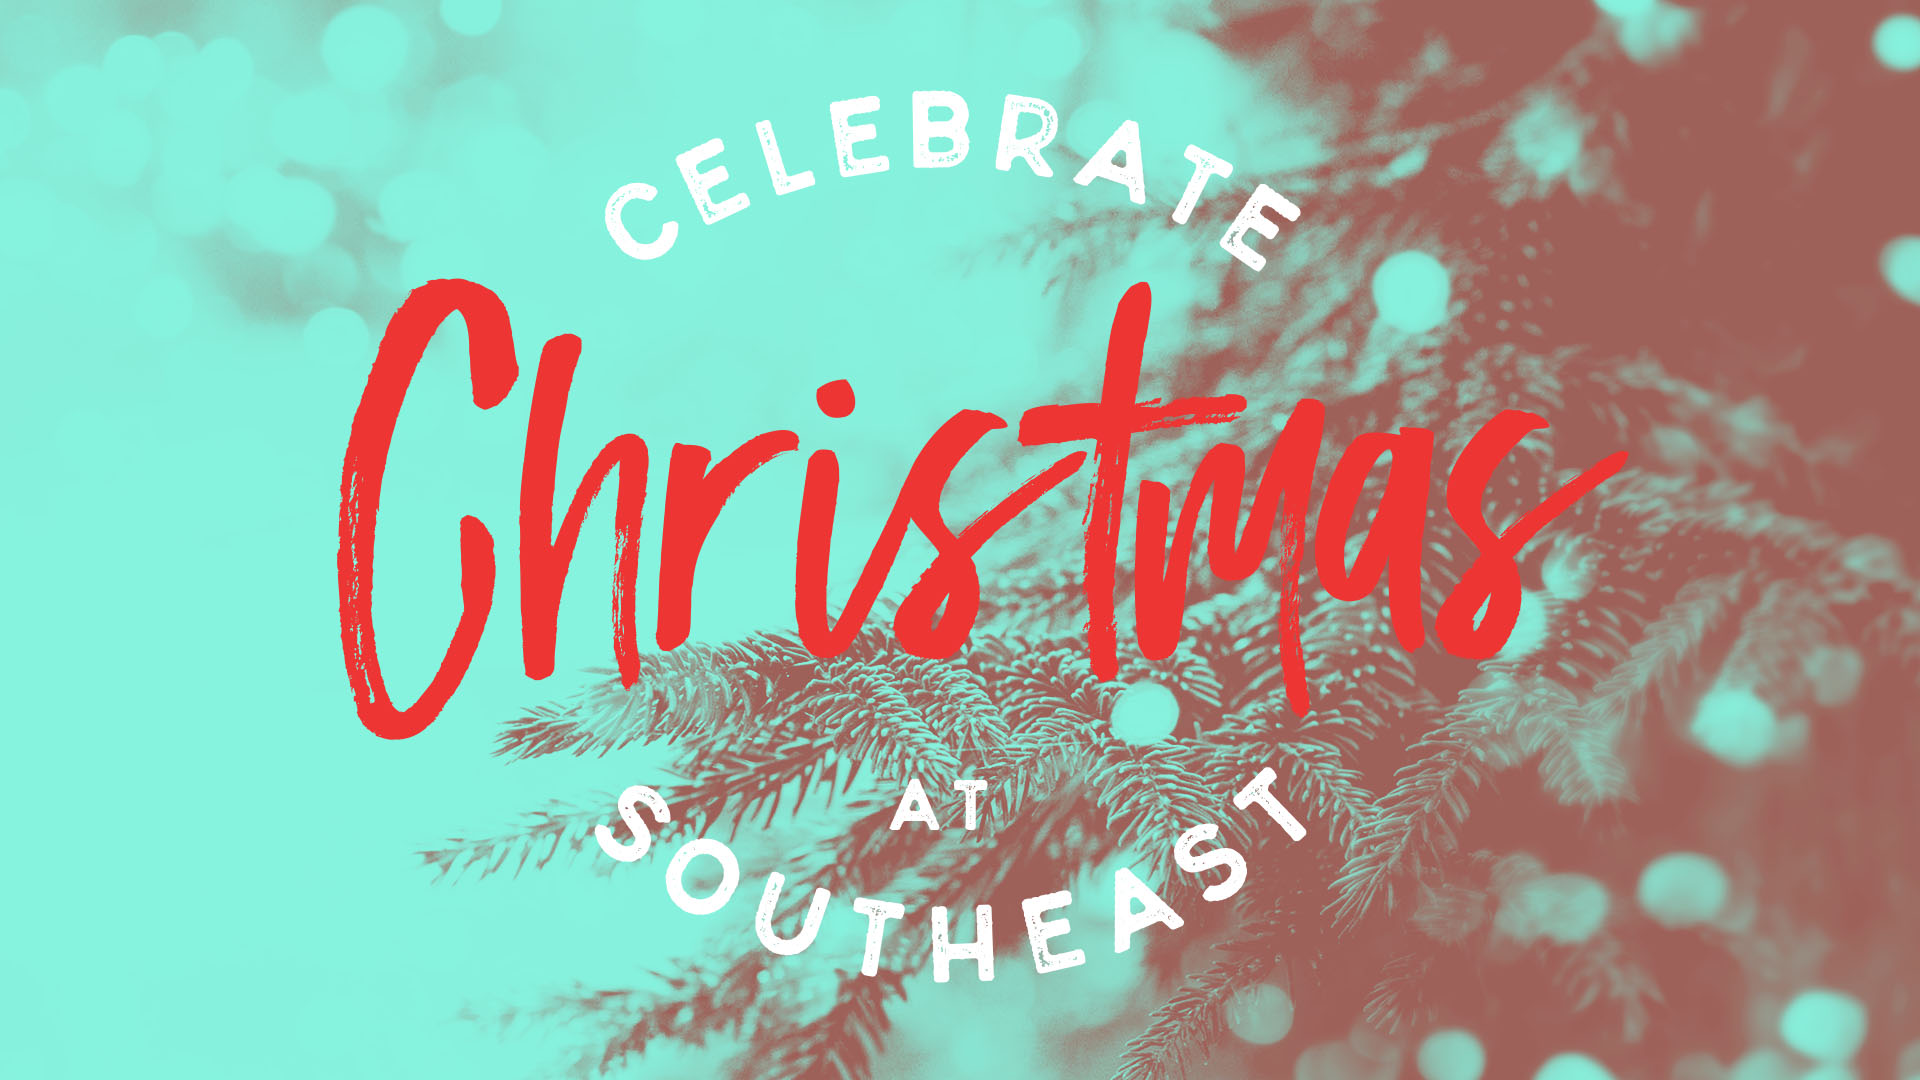 Christmas at Southeast | Shane Harris Graphic Design - Melbourne Florida Graphic Design